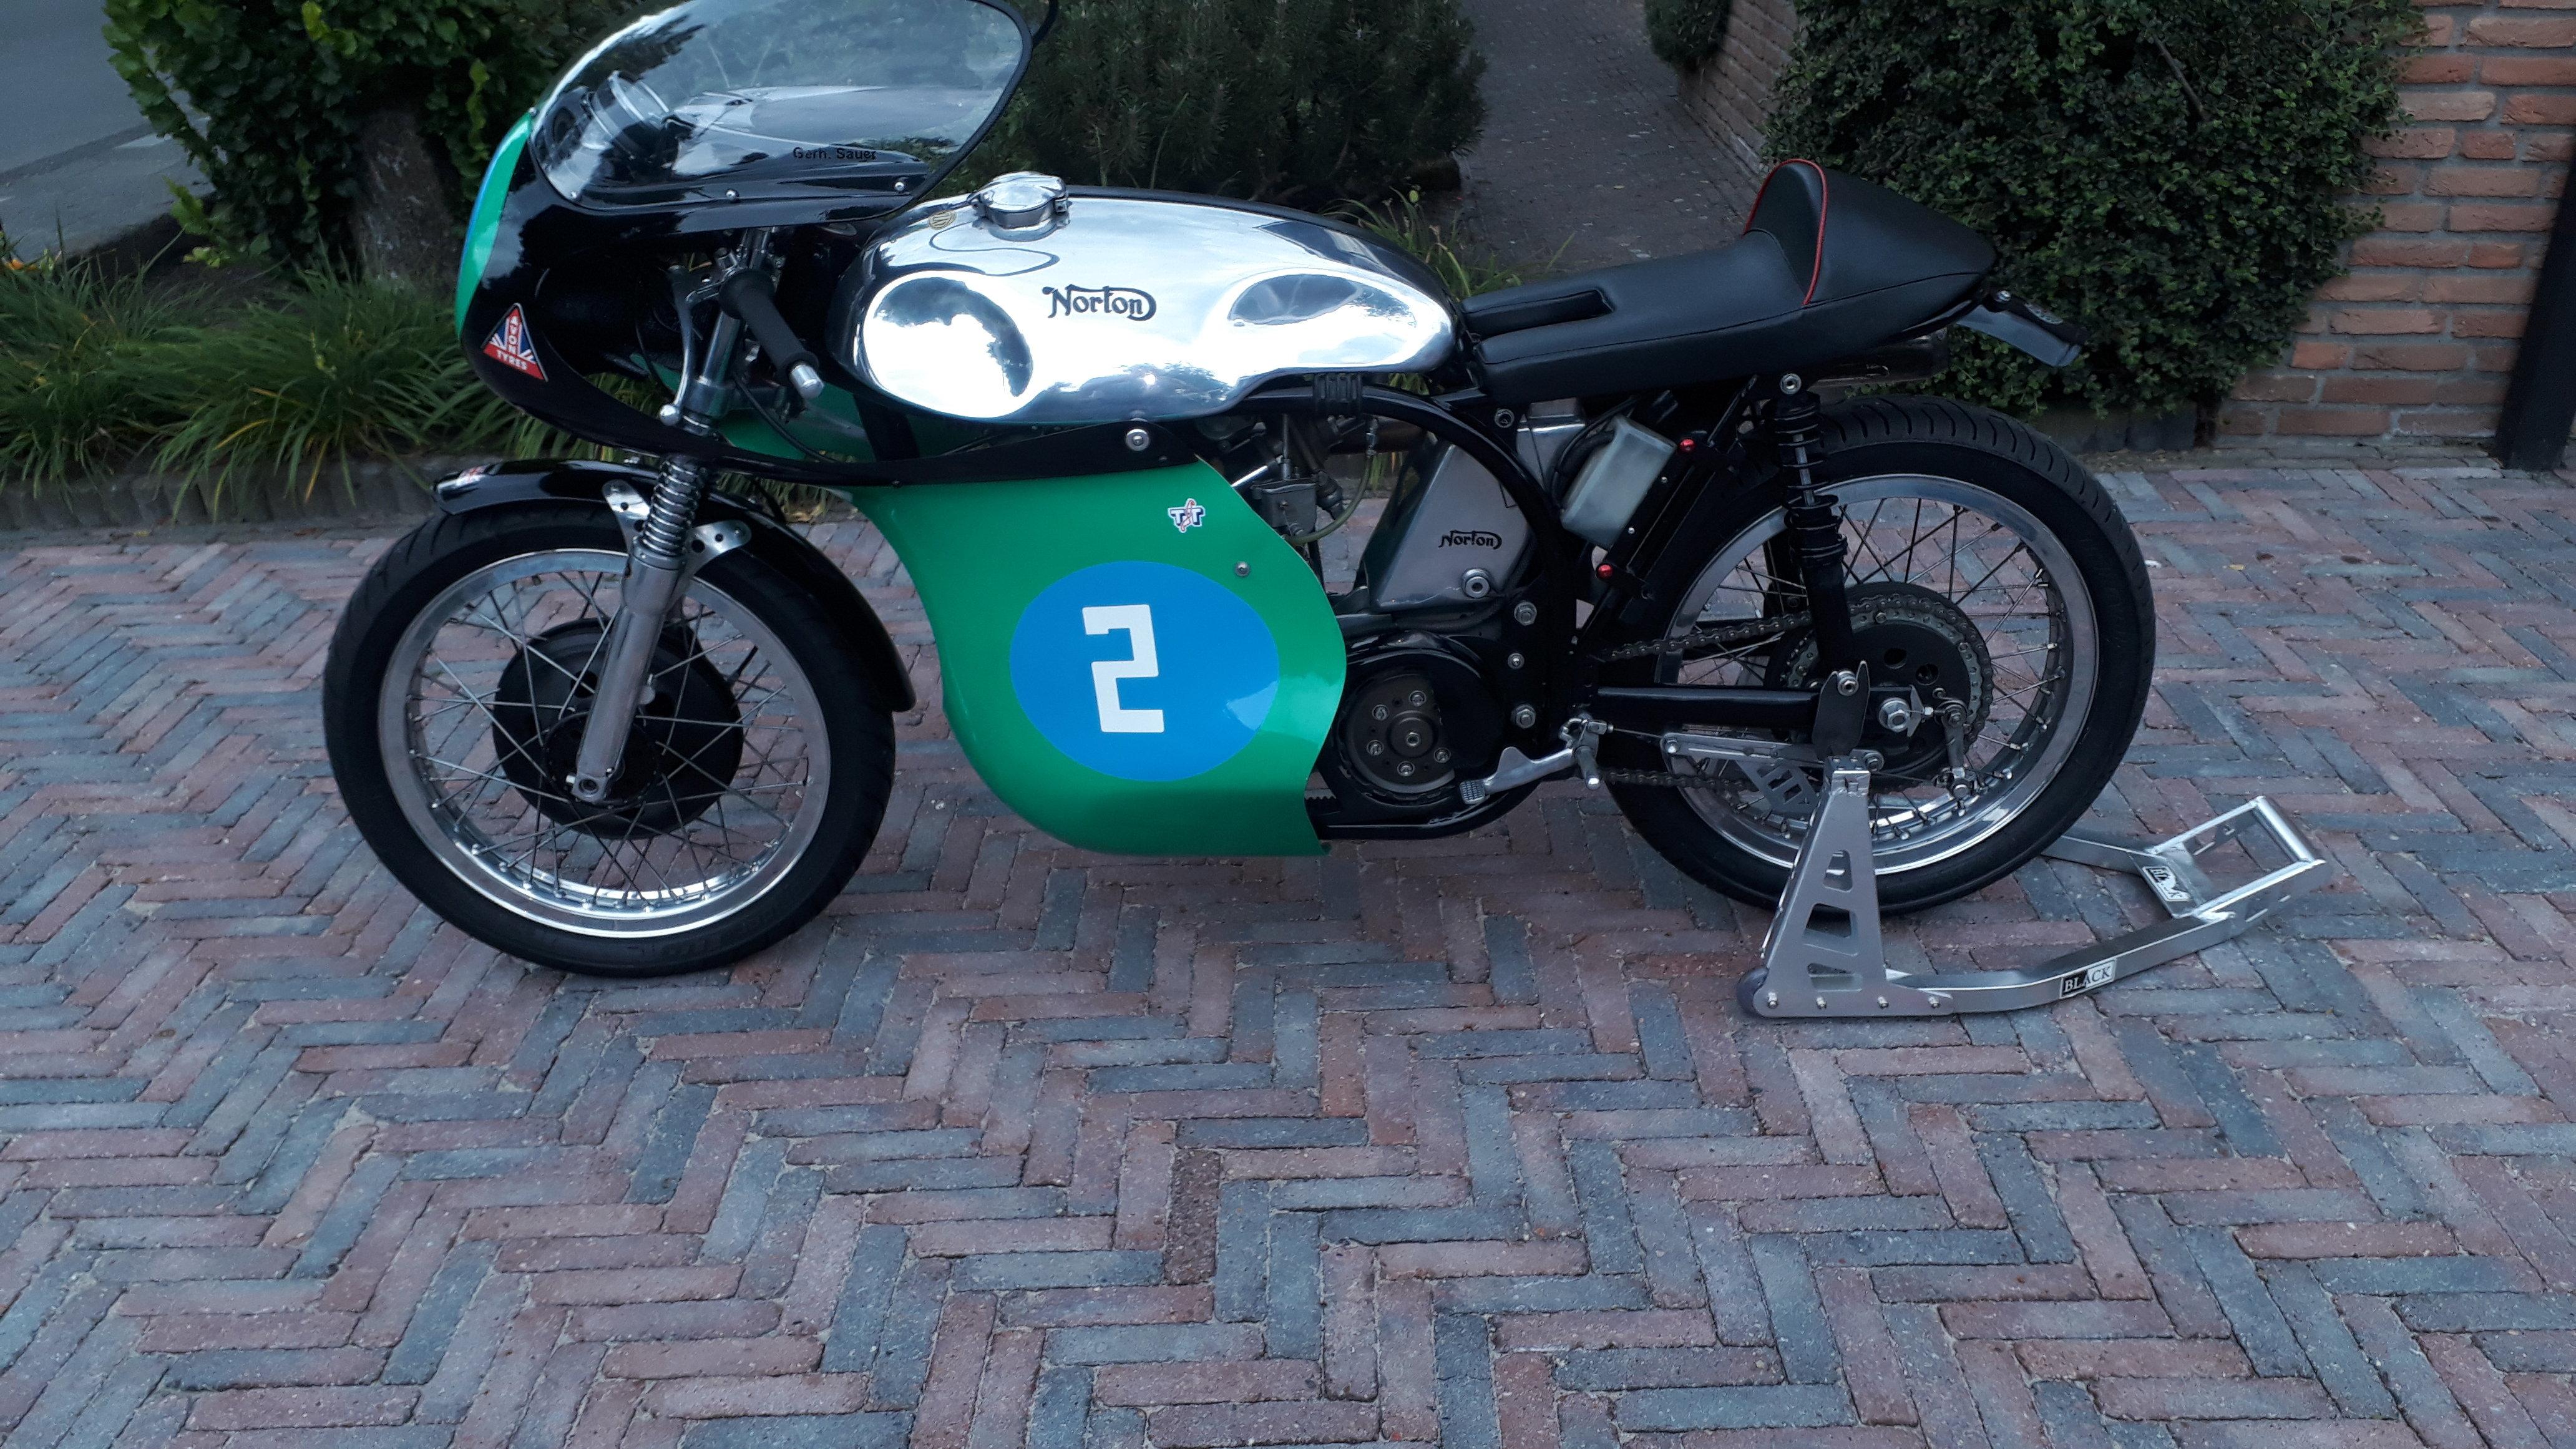 1961 Norton manx classicracer 40m. For Sale (picture 1 of 4)